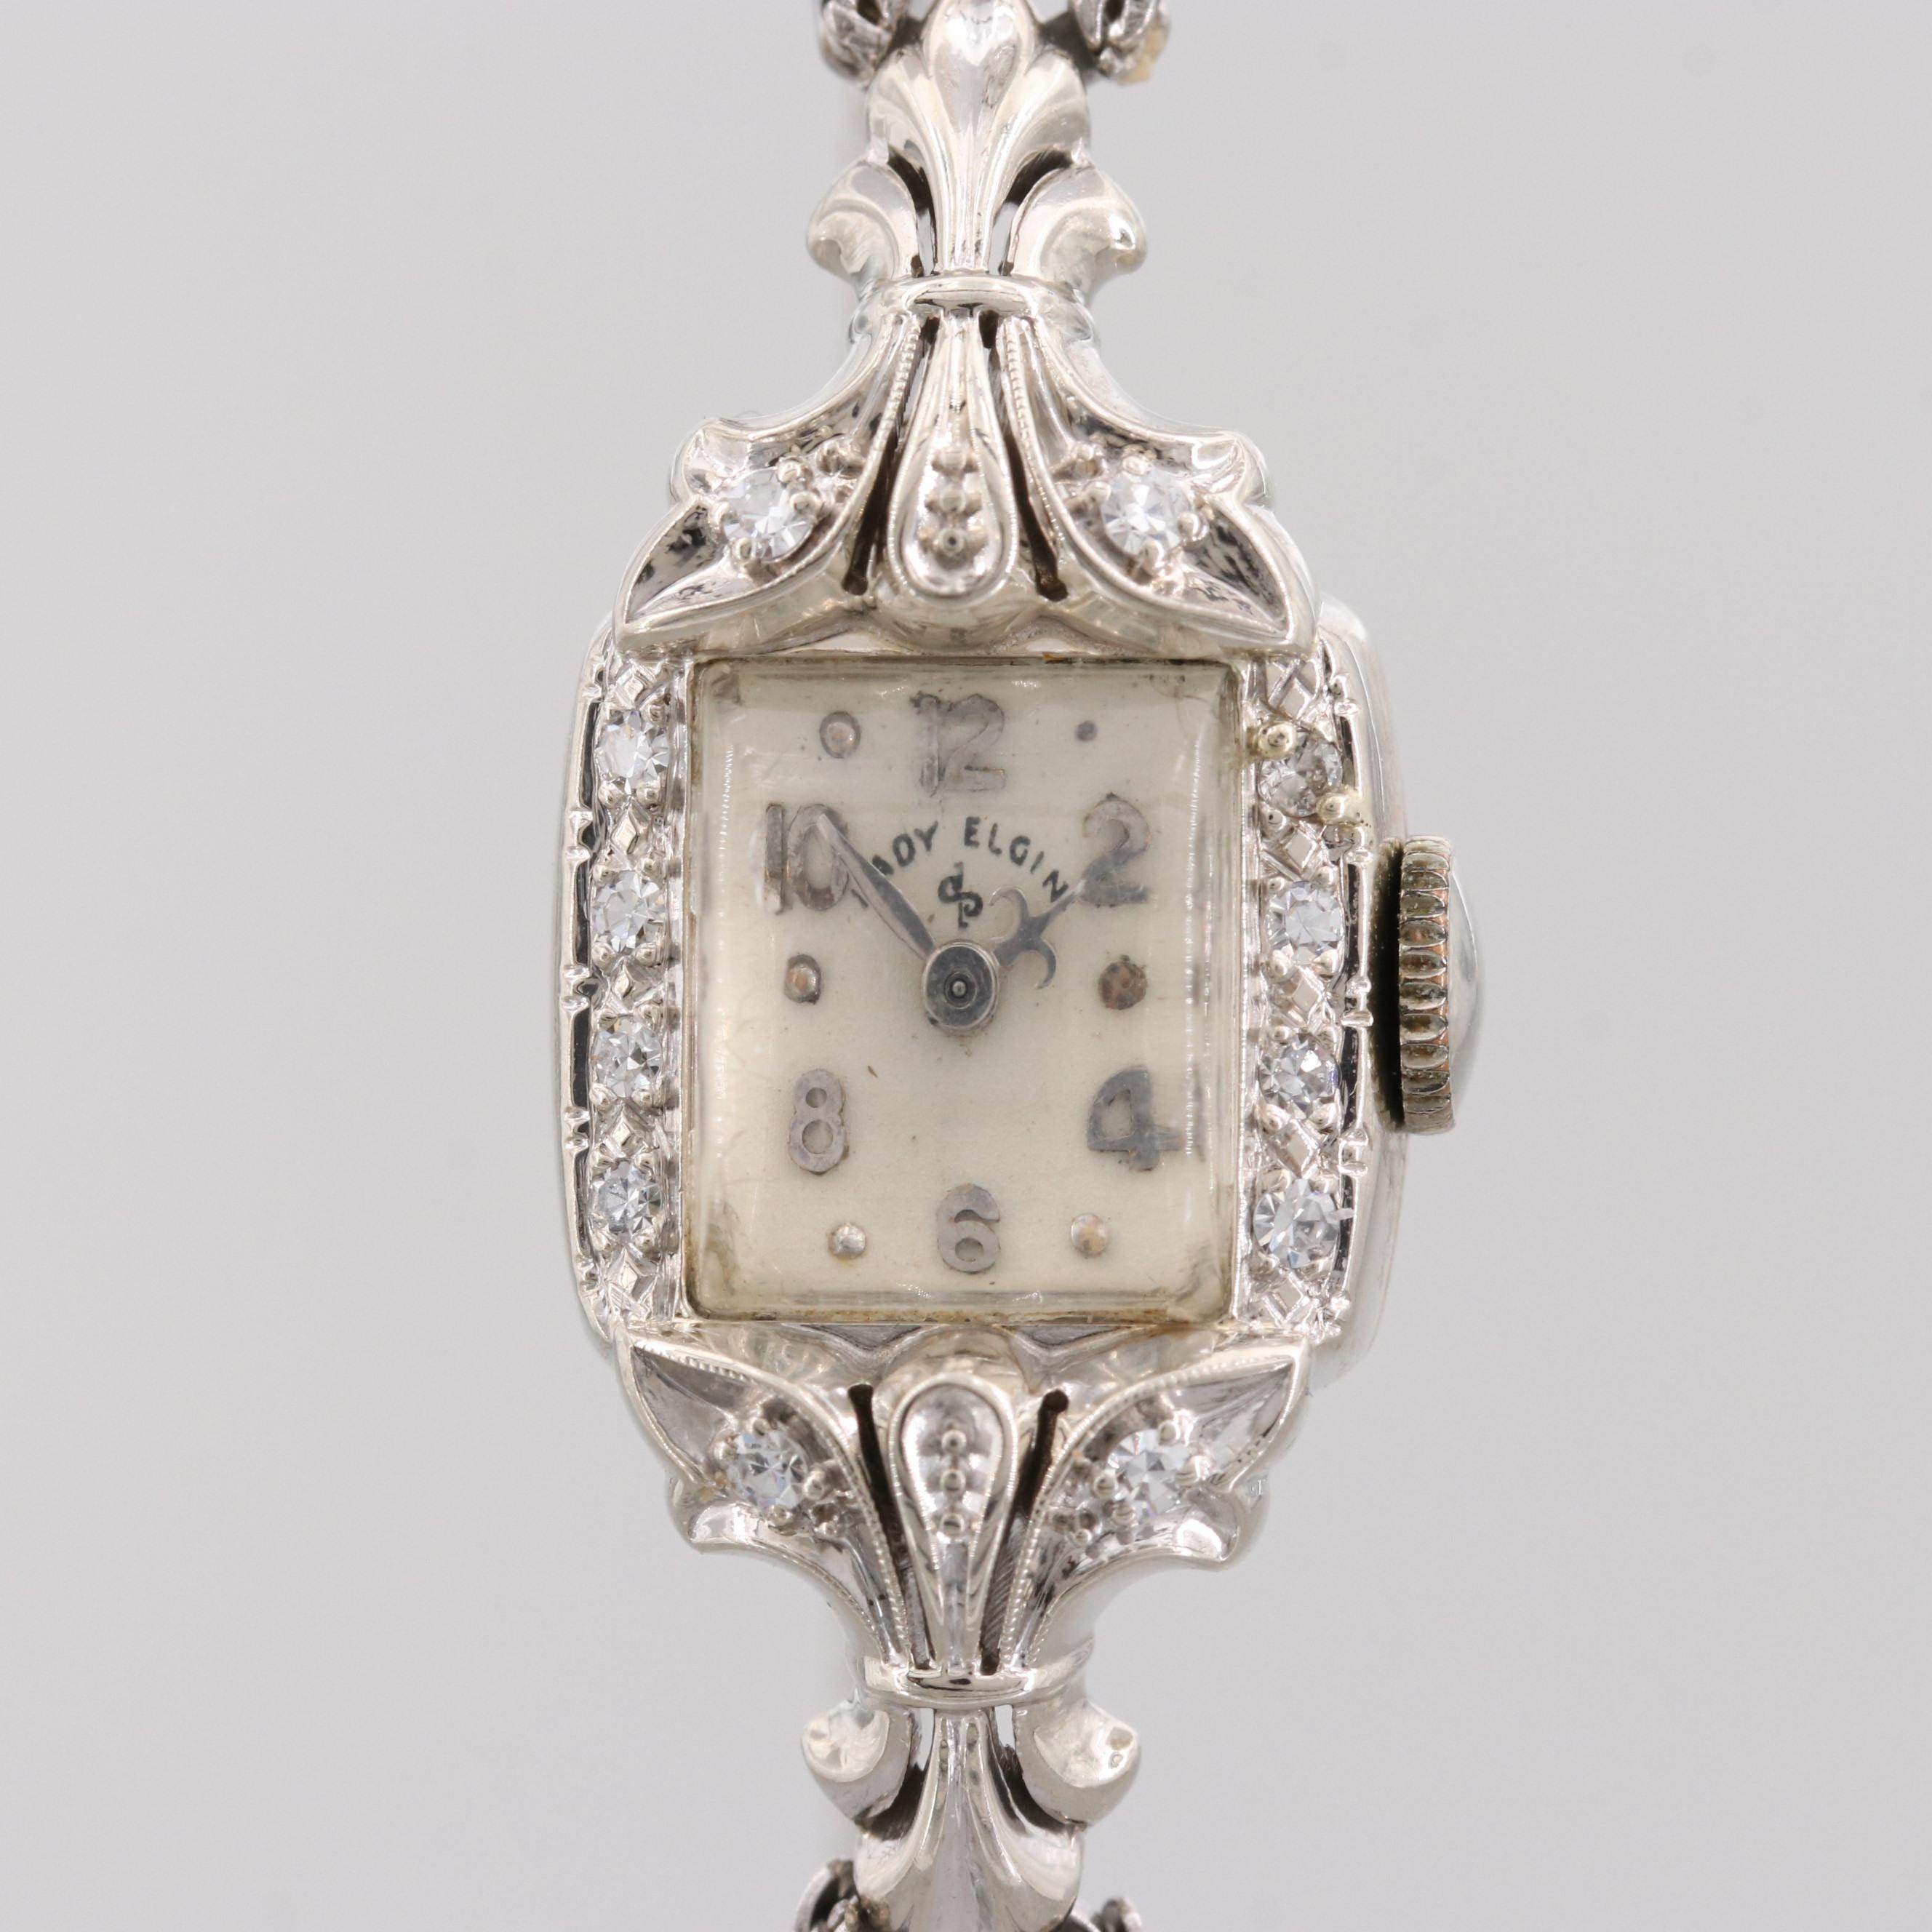 Lady Elgin 14K White Gold Diamond Wristwatch